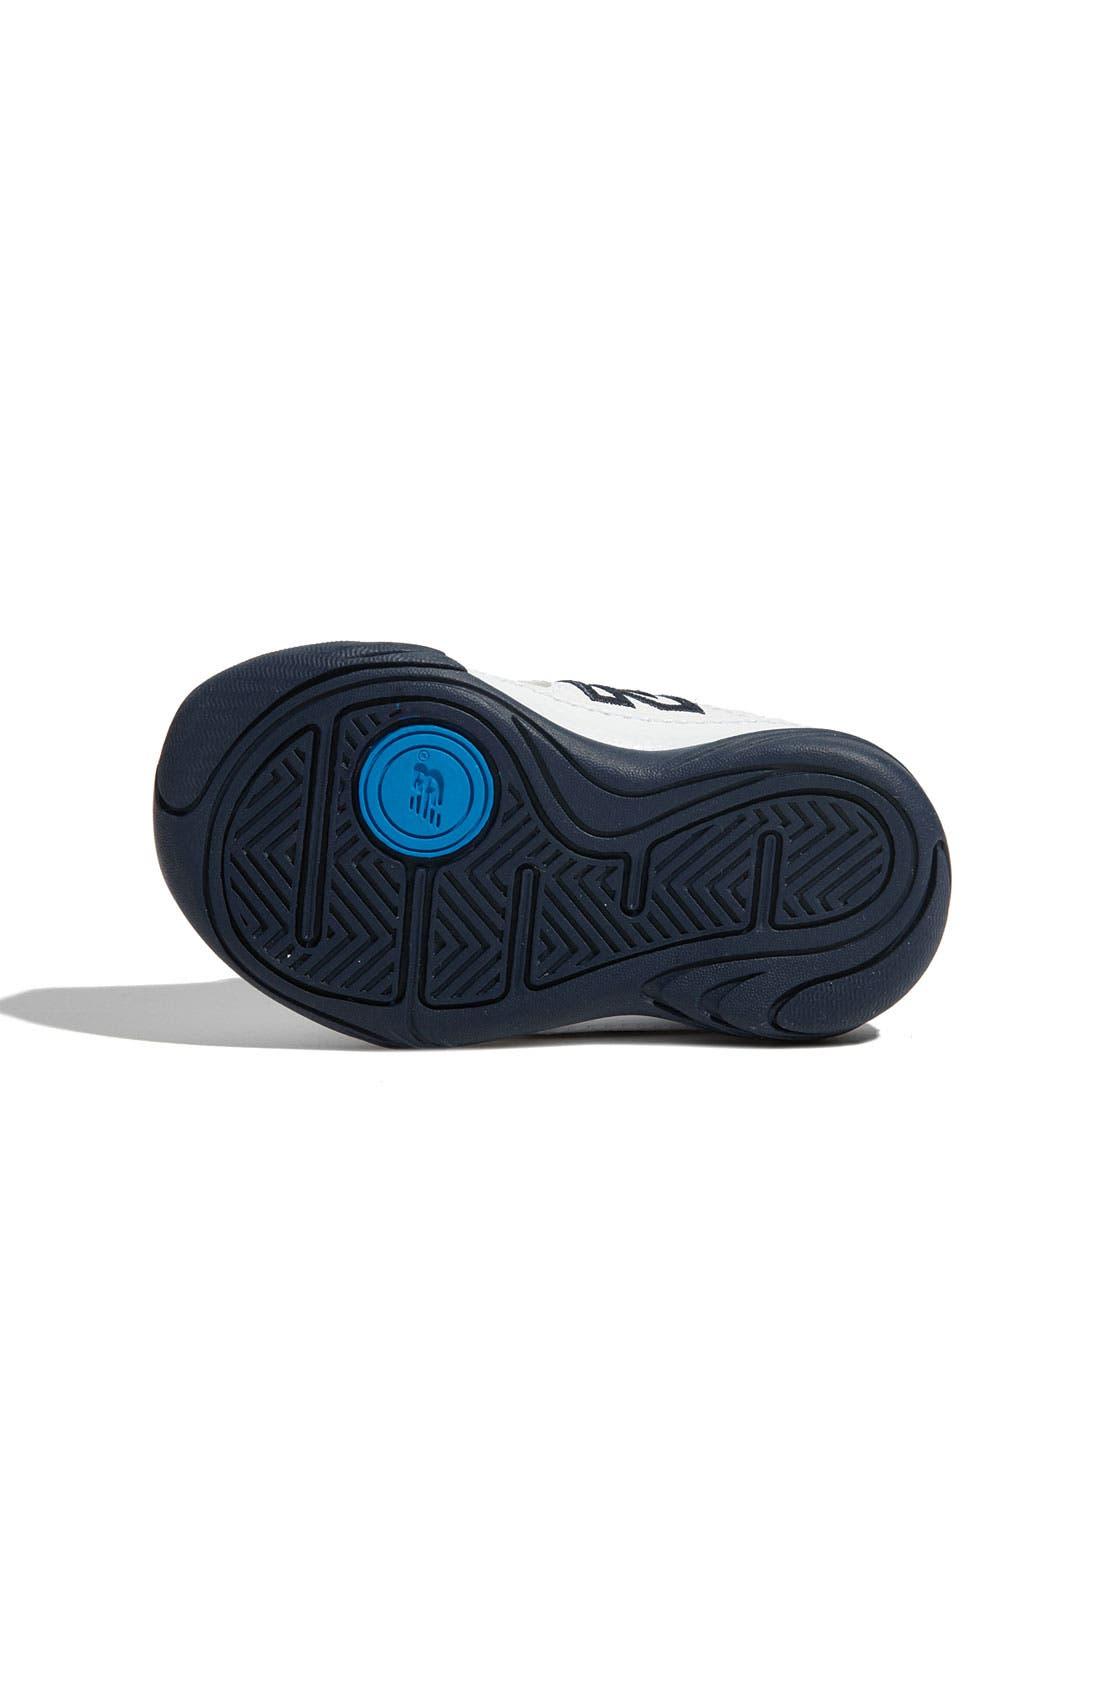 Alternate Image 3  - New Balance '504' Sneaker (Baby, Walker & Toddler)